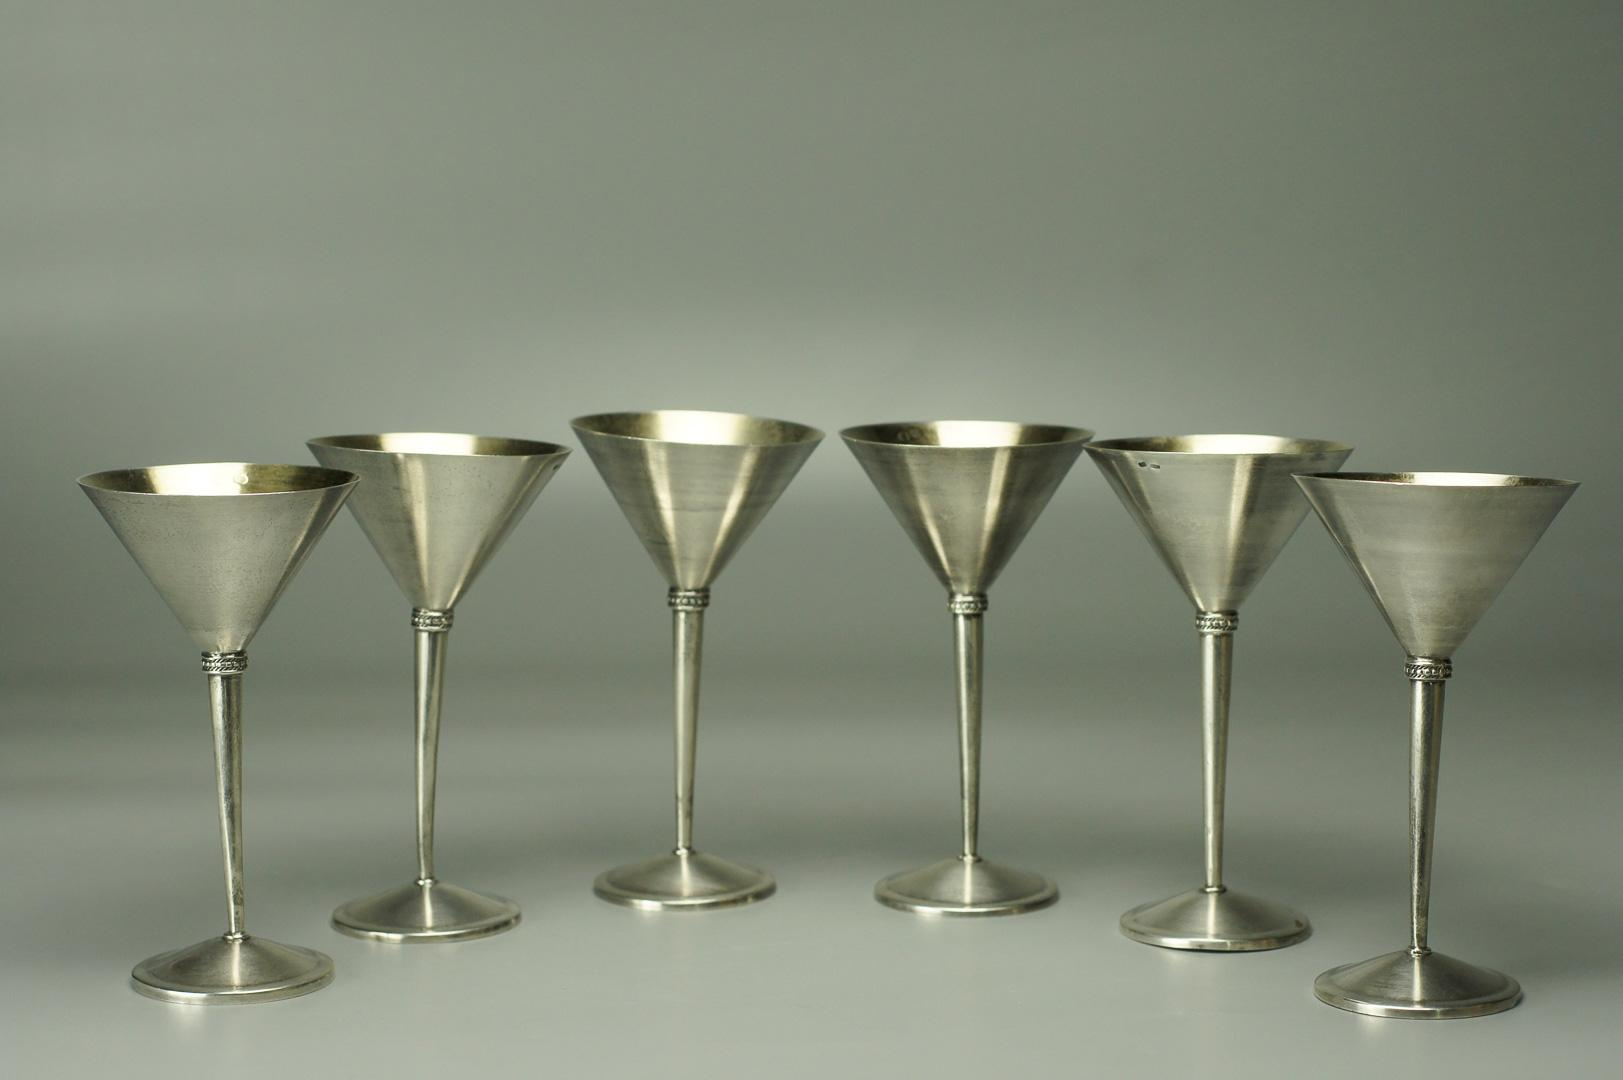 Рюмки серебро 6 штук